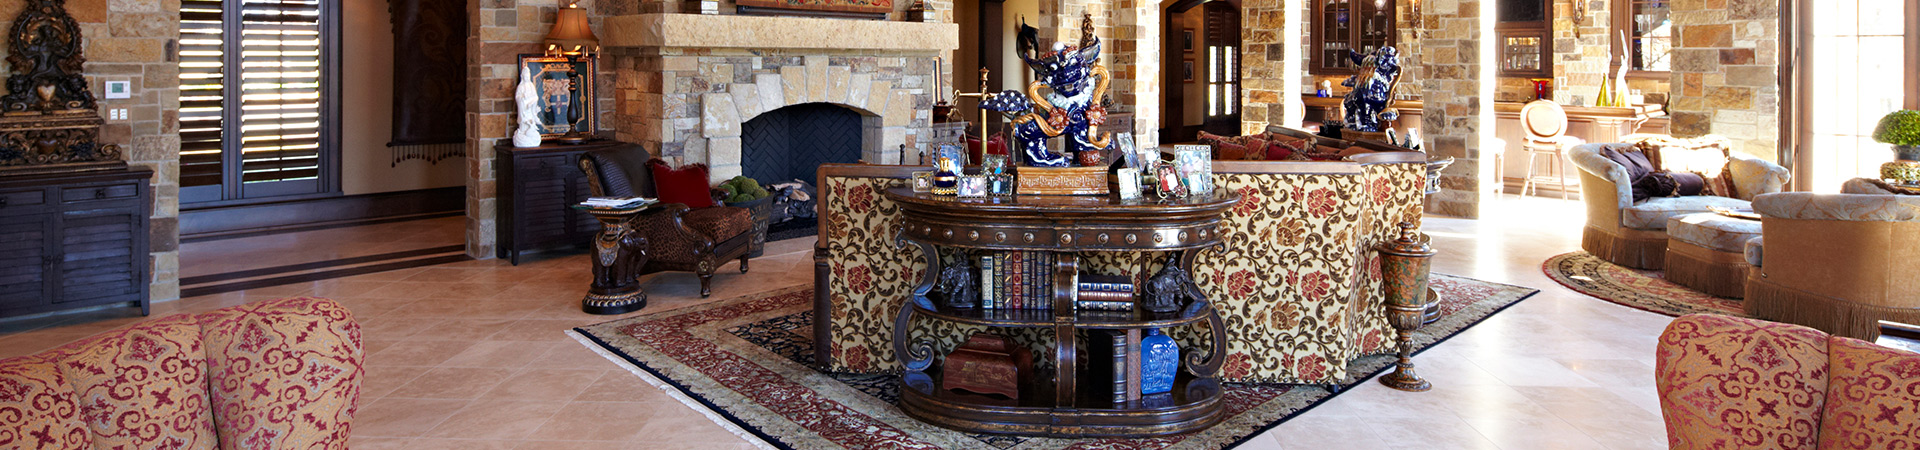 Living room details from house designed by Sam Vercher from Tyler Texas